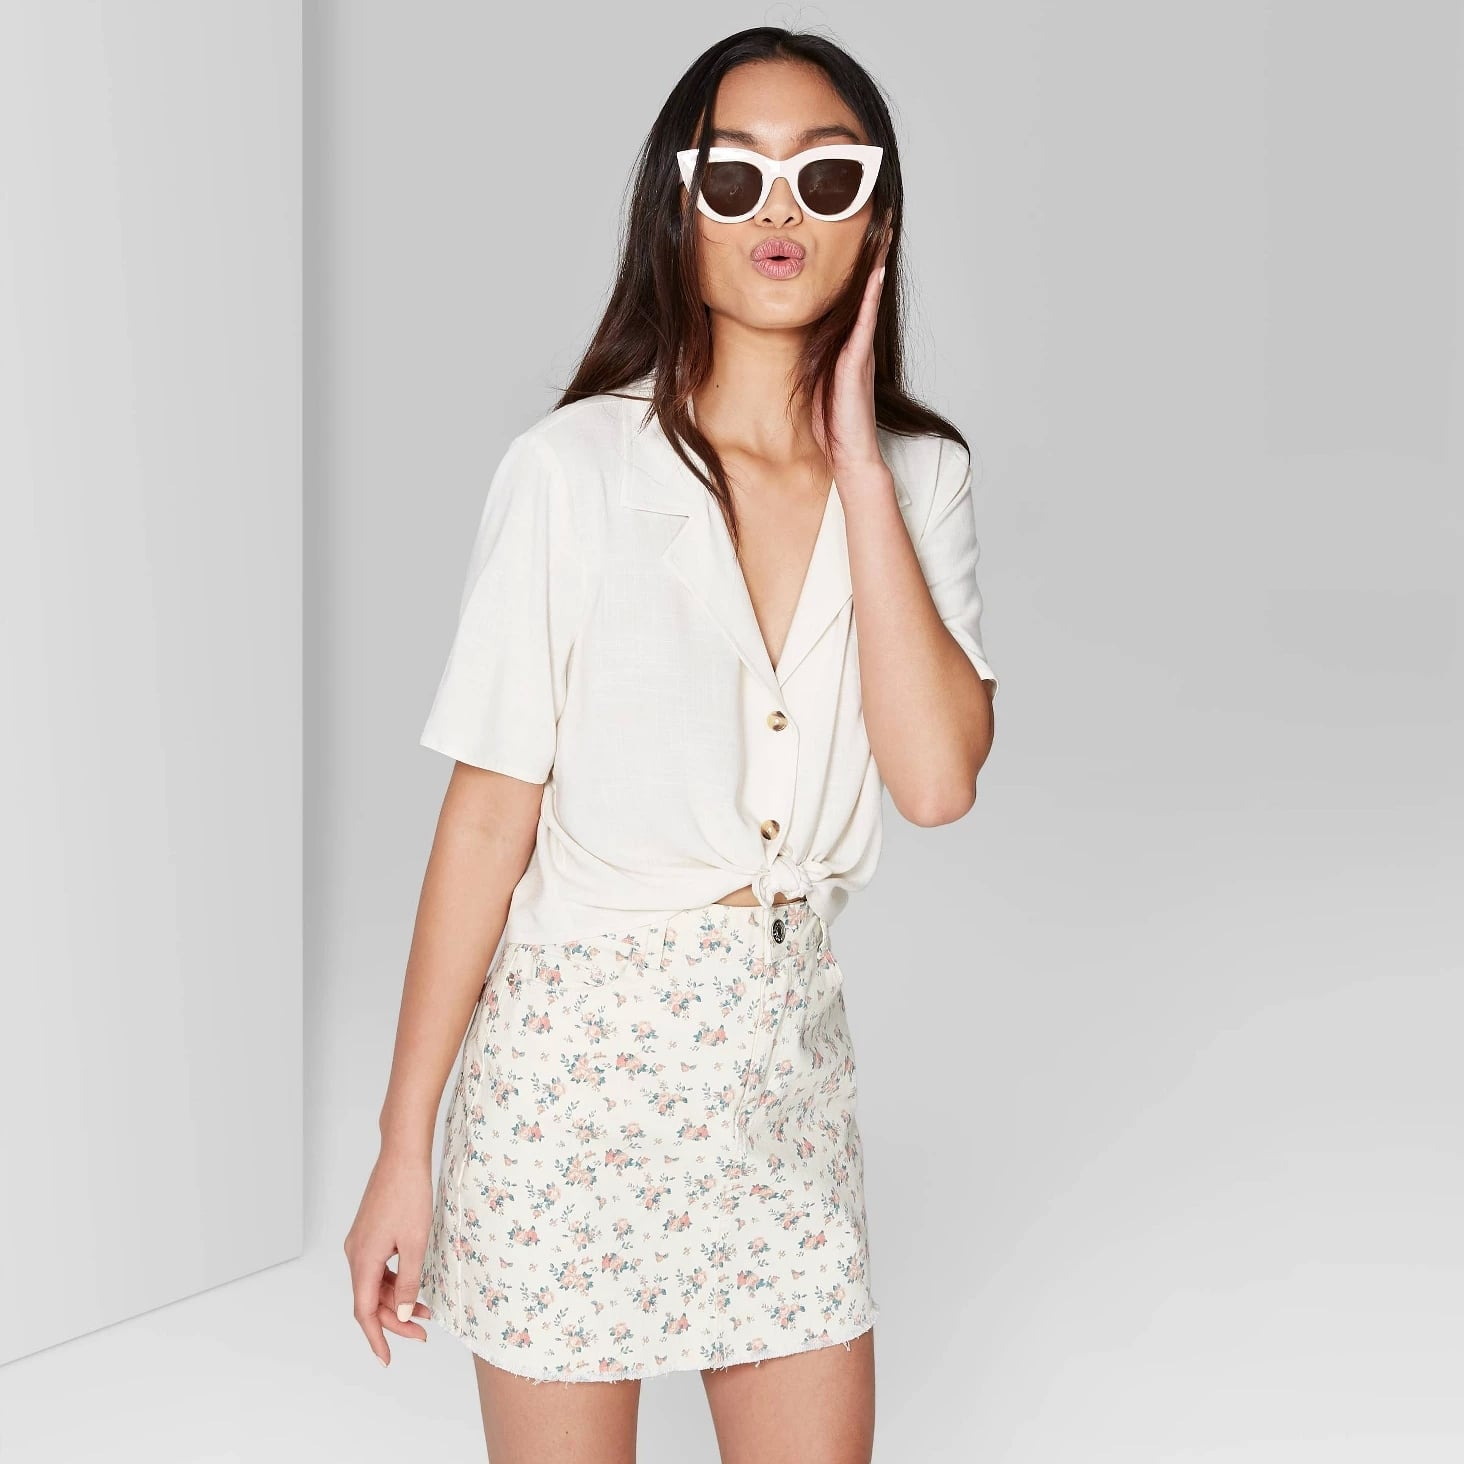 fc00bce61da784 Women's High-Rise Zip Front Cargo Pants | Best Wild Fable Clothing at Target  | POPSUGAR Fashion Photo 79